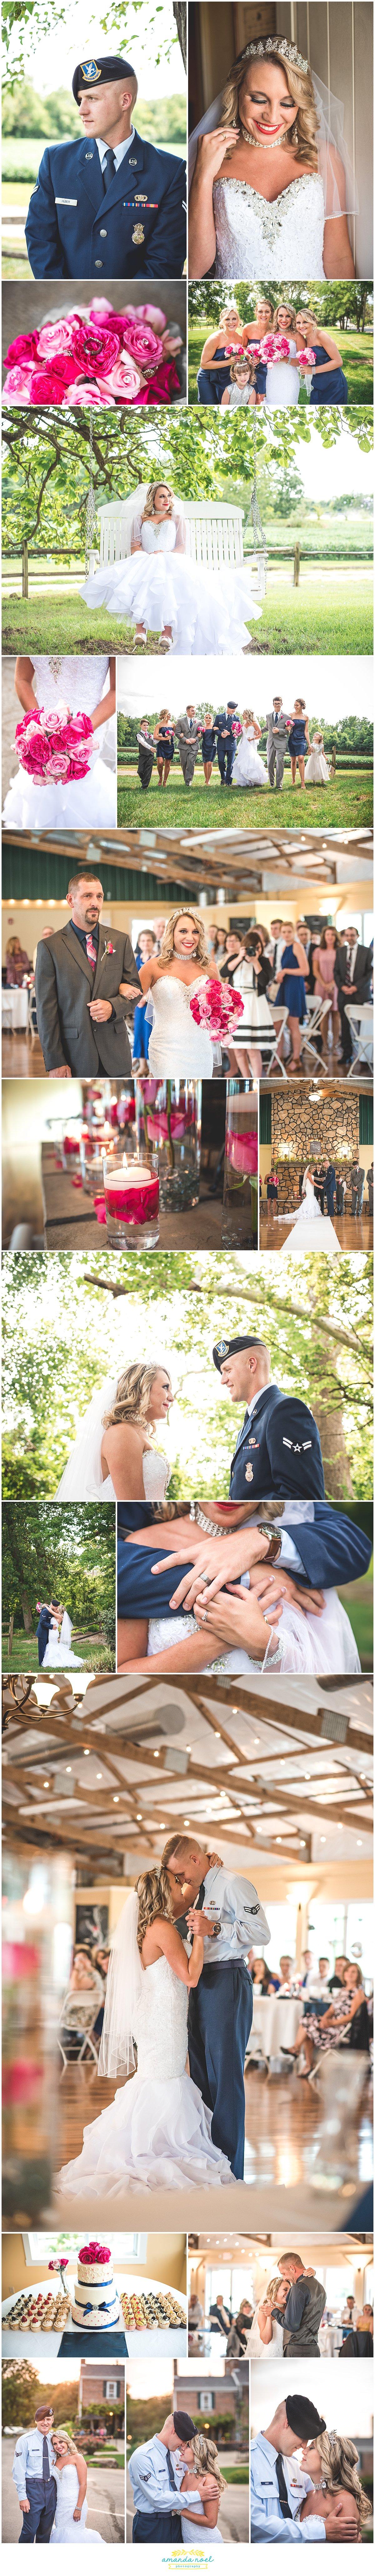 Springfield, Ohio Wedding Photographer - summer wedding at Simon Kenton Inn